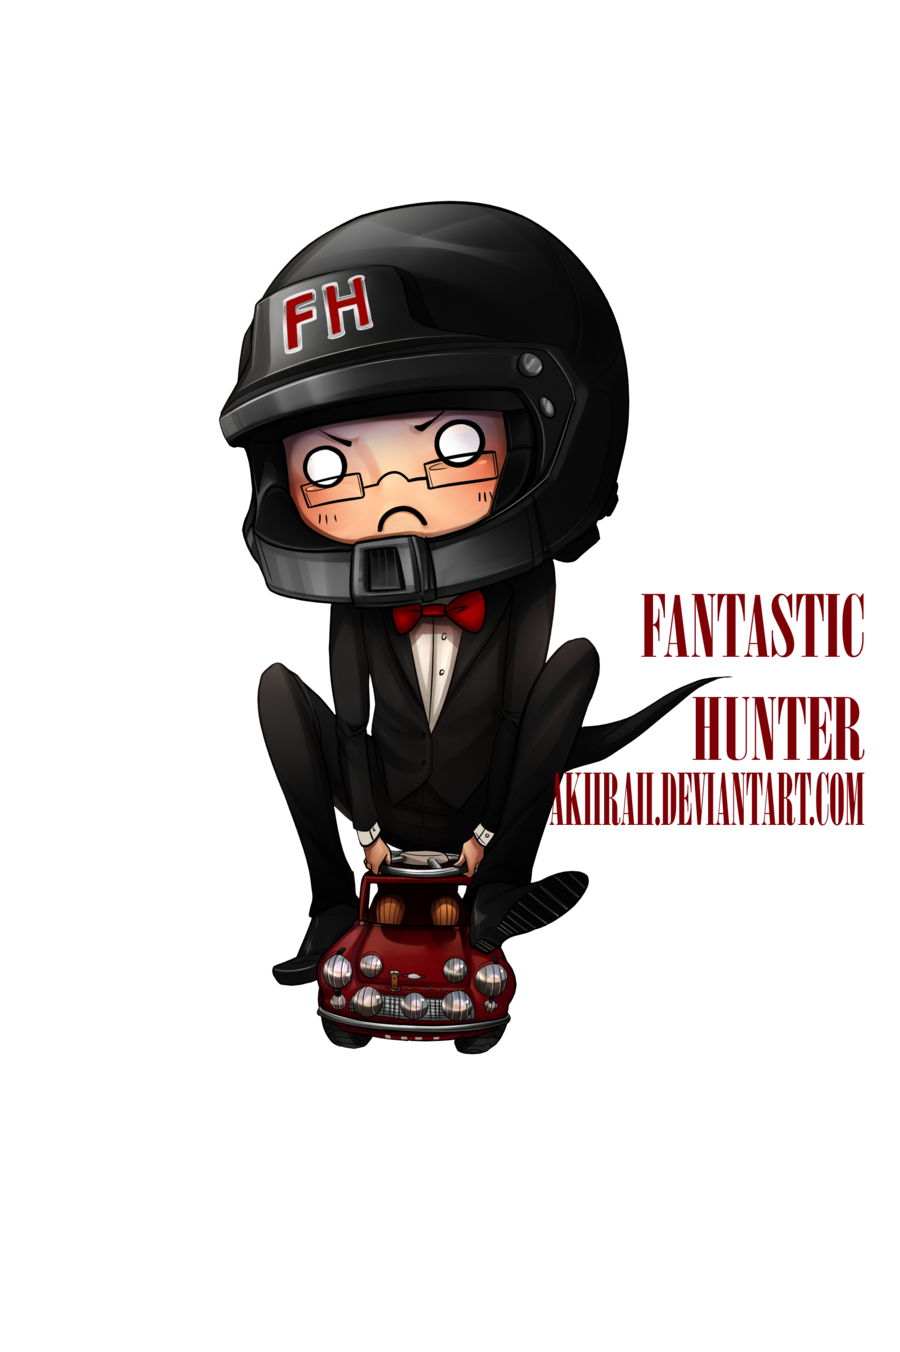 Commission: FantasticHunter